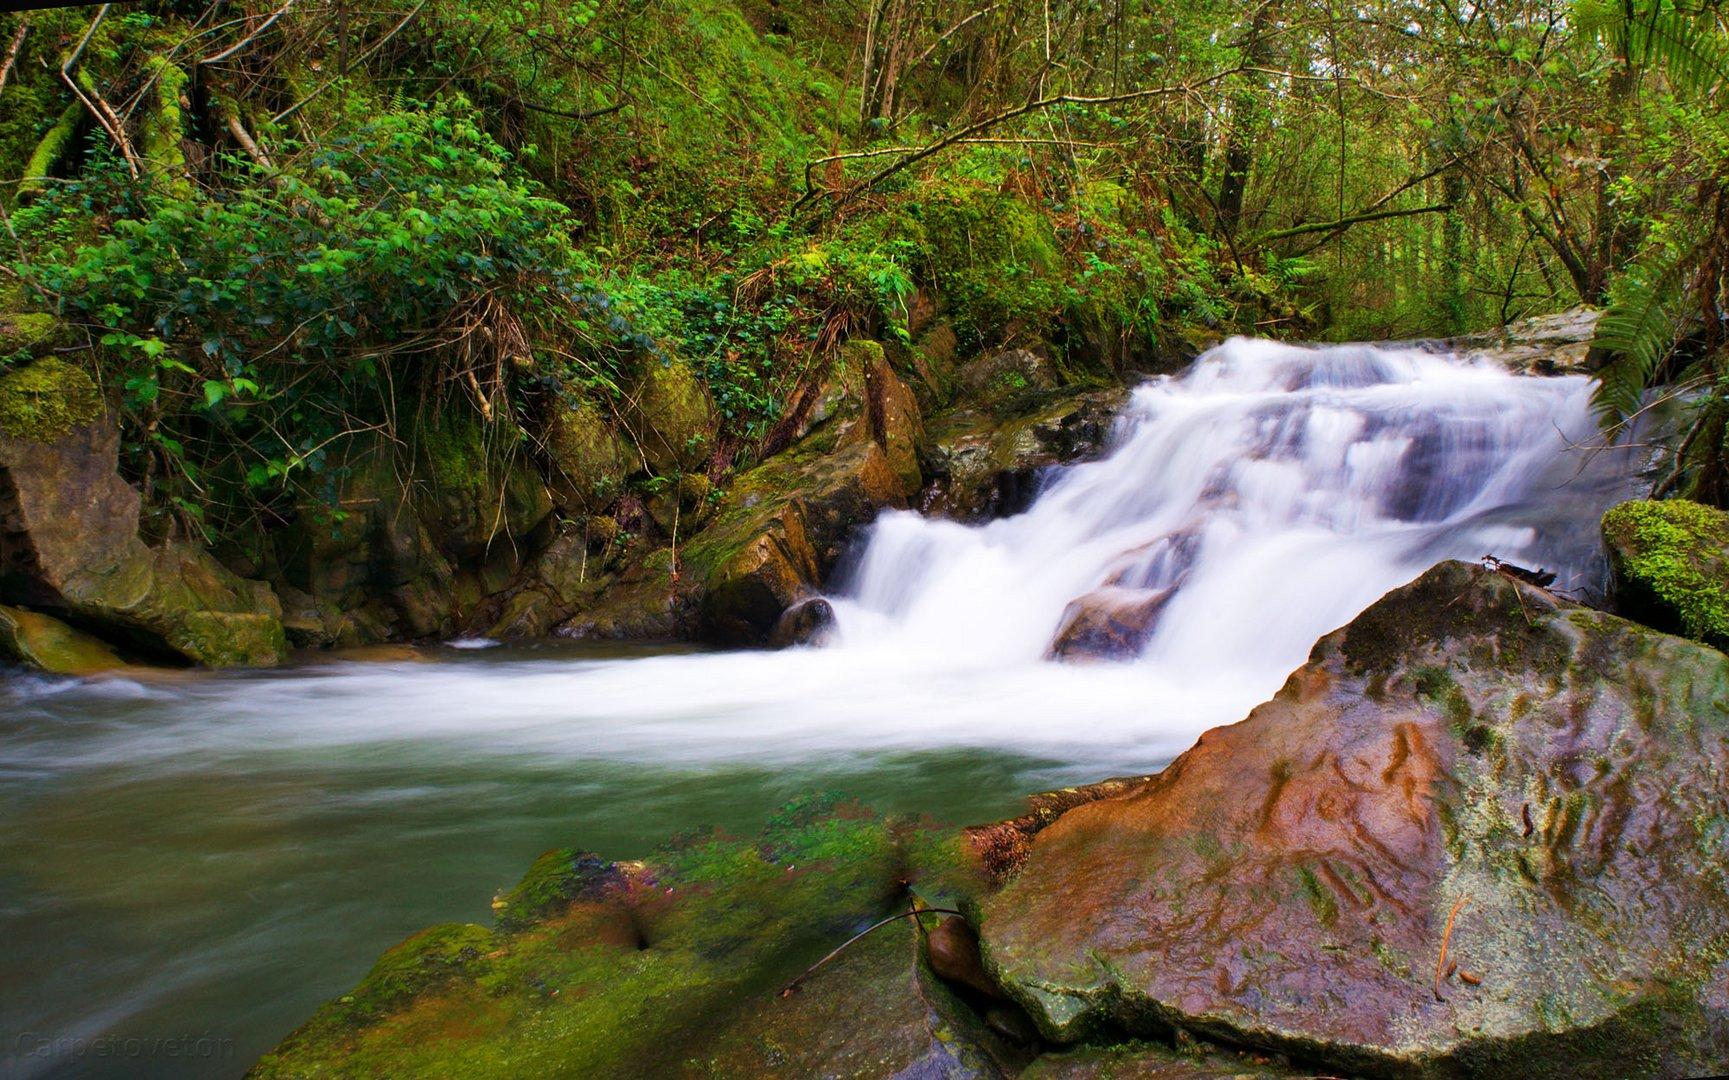 El arroyo de Callejamala